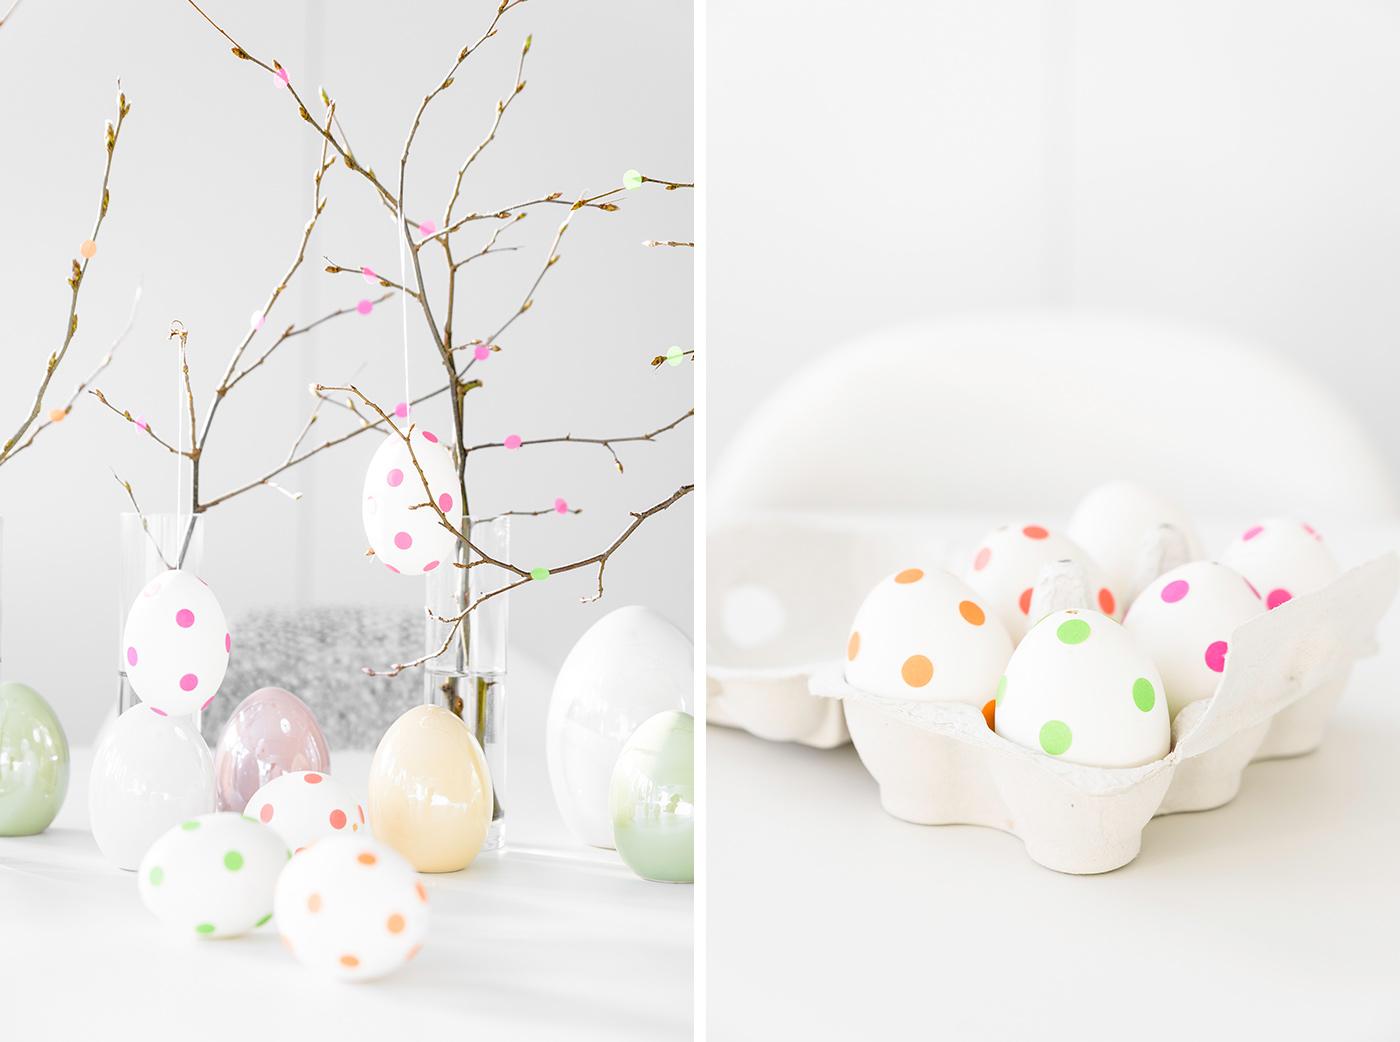 Eier verzieren - DIY Osterdeko